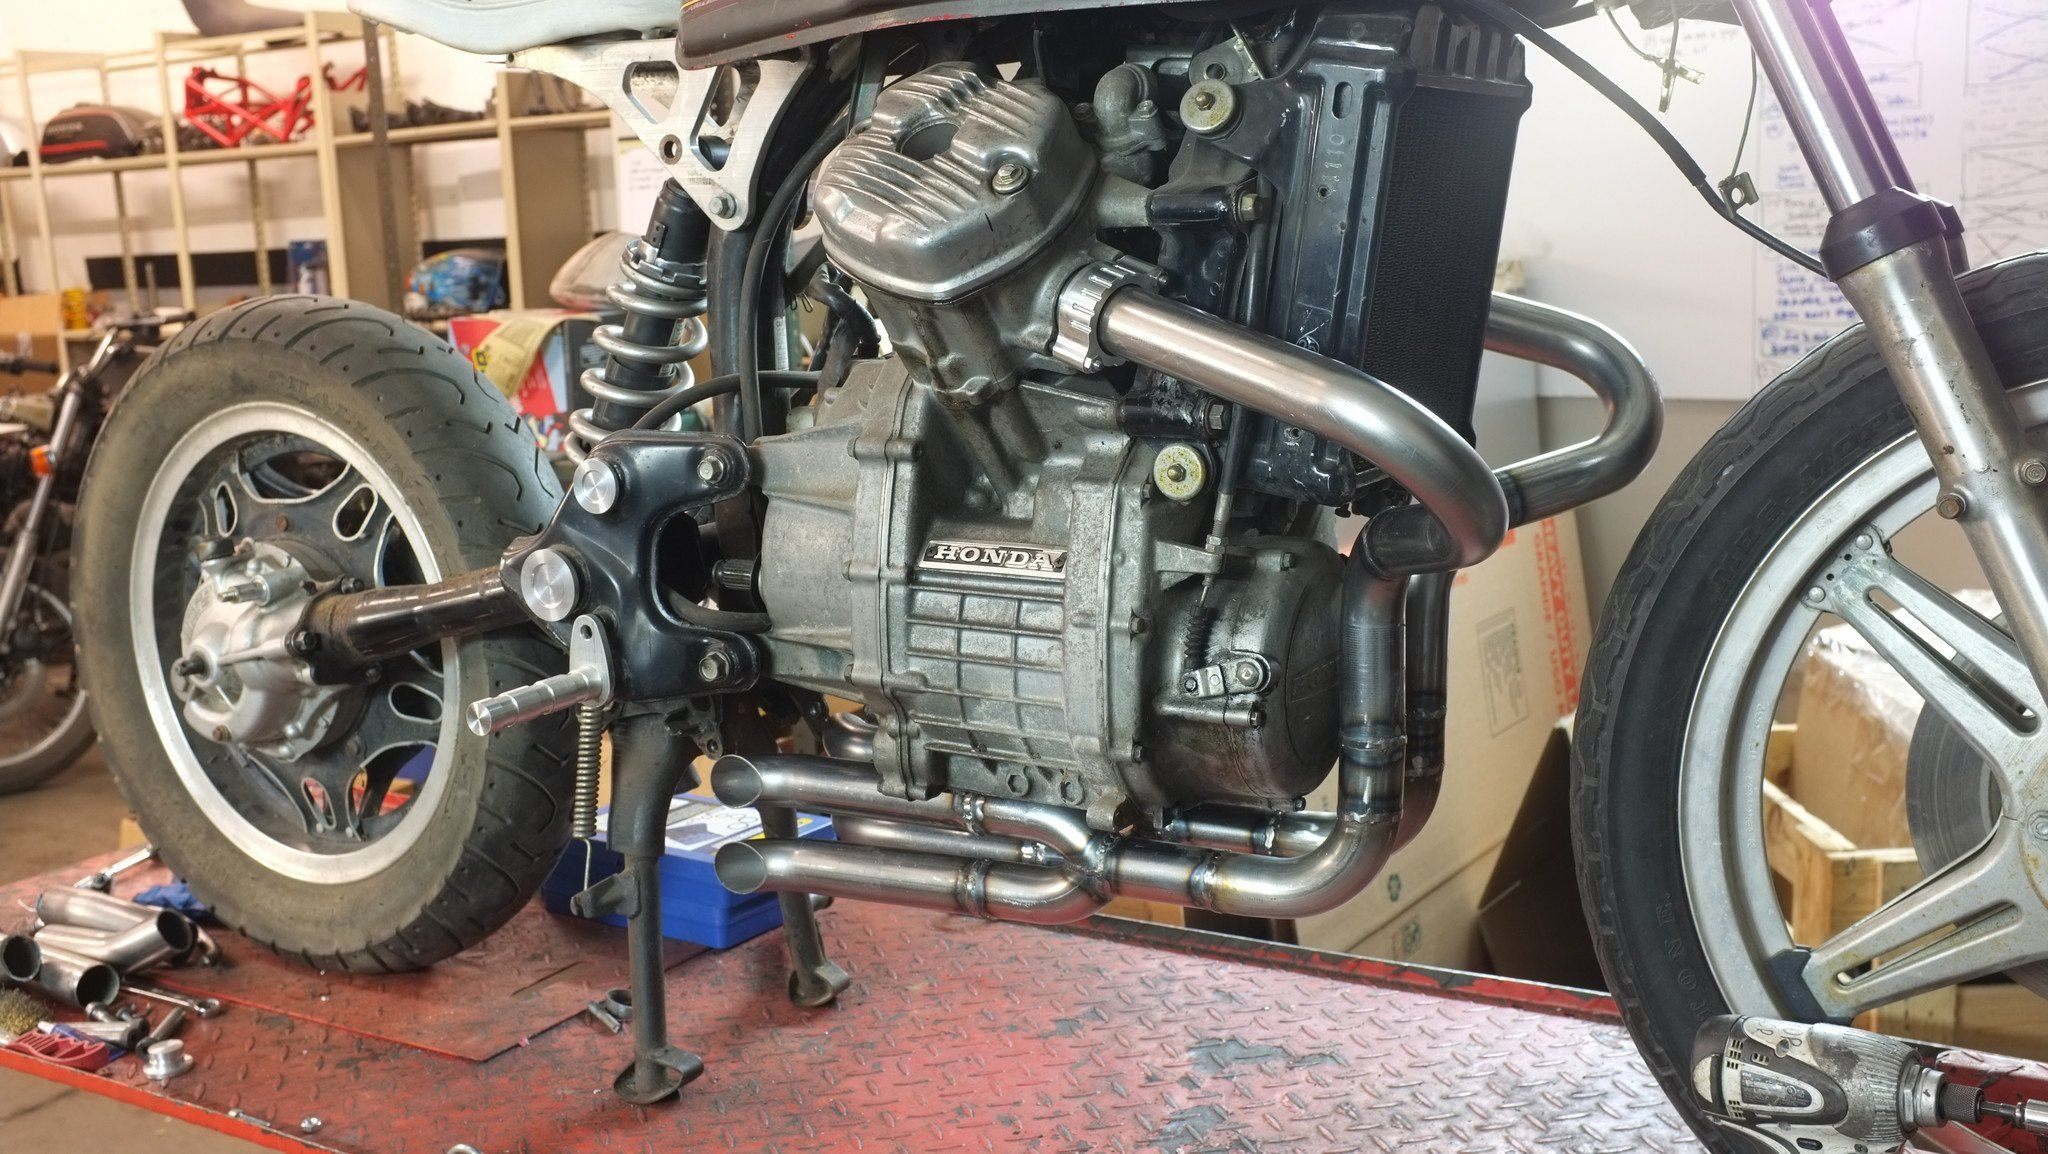 CX500-GL500, CX650-GL650- 2 in 4 exhaust system   Brat cx500